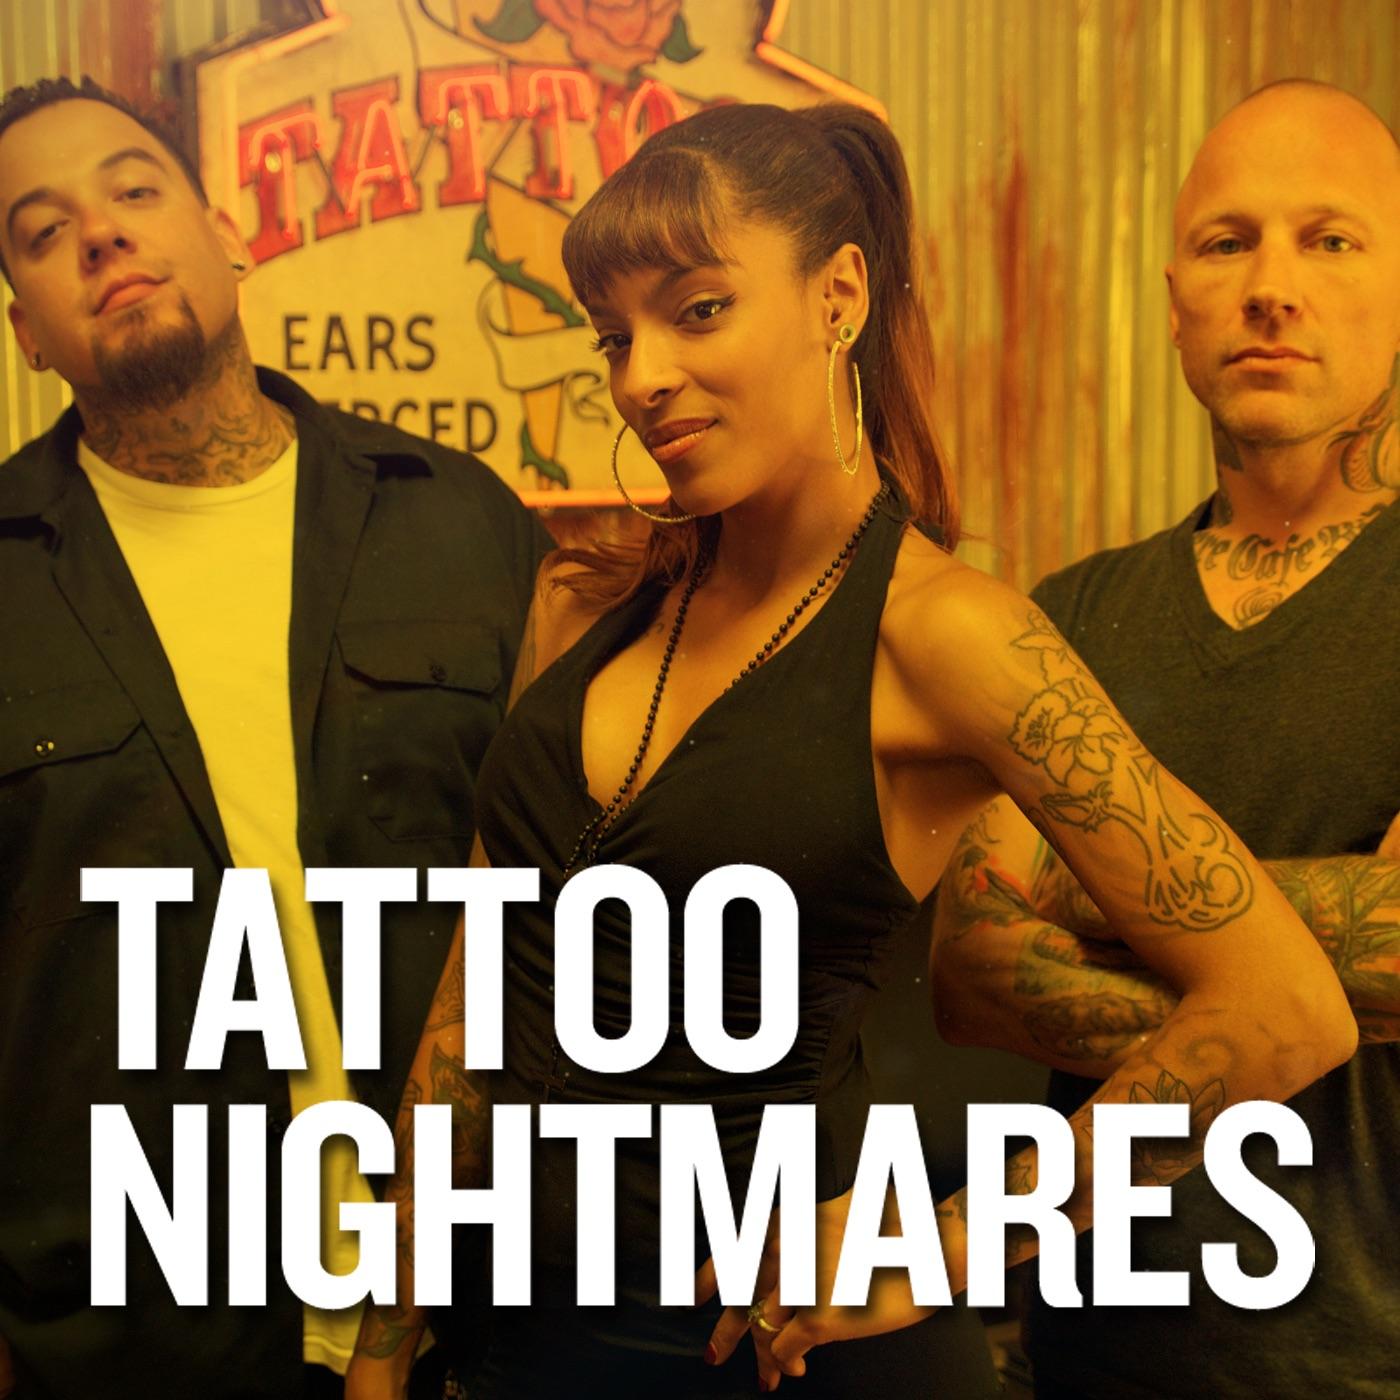 Tattoo nightmares season 1 on itunes for Is tattoo nightmares still on